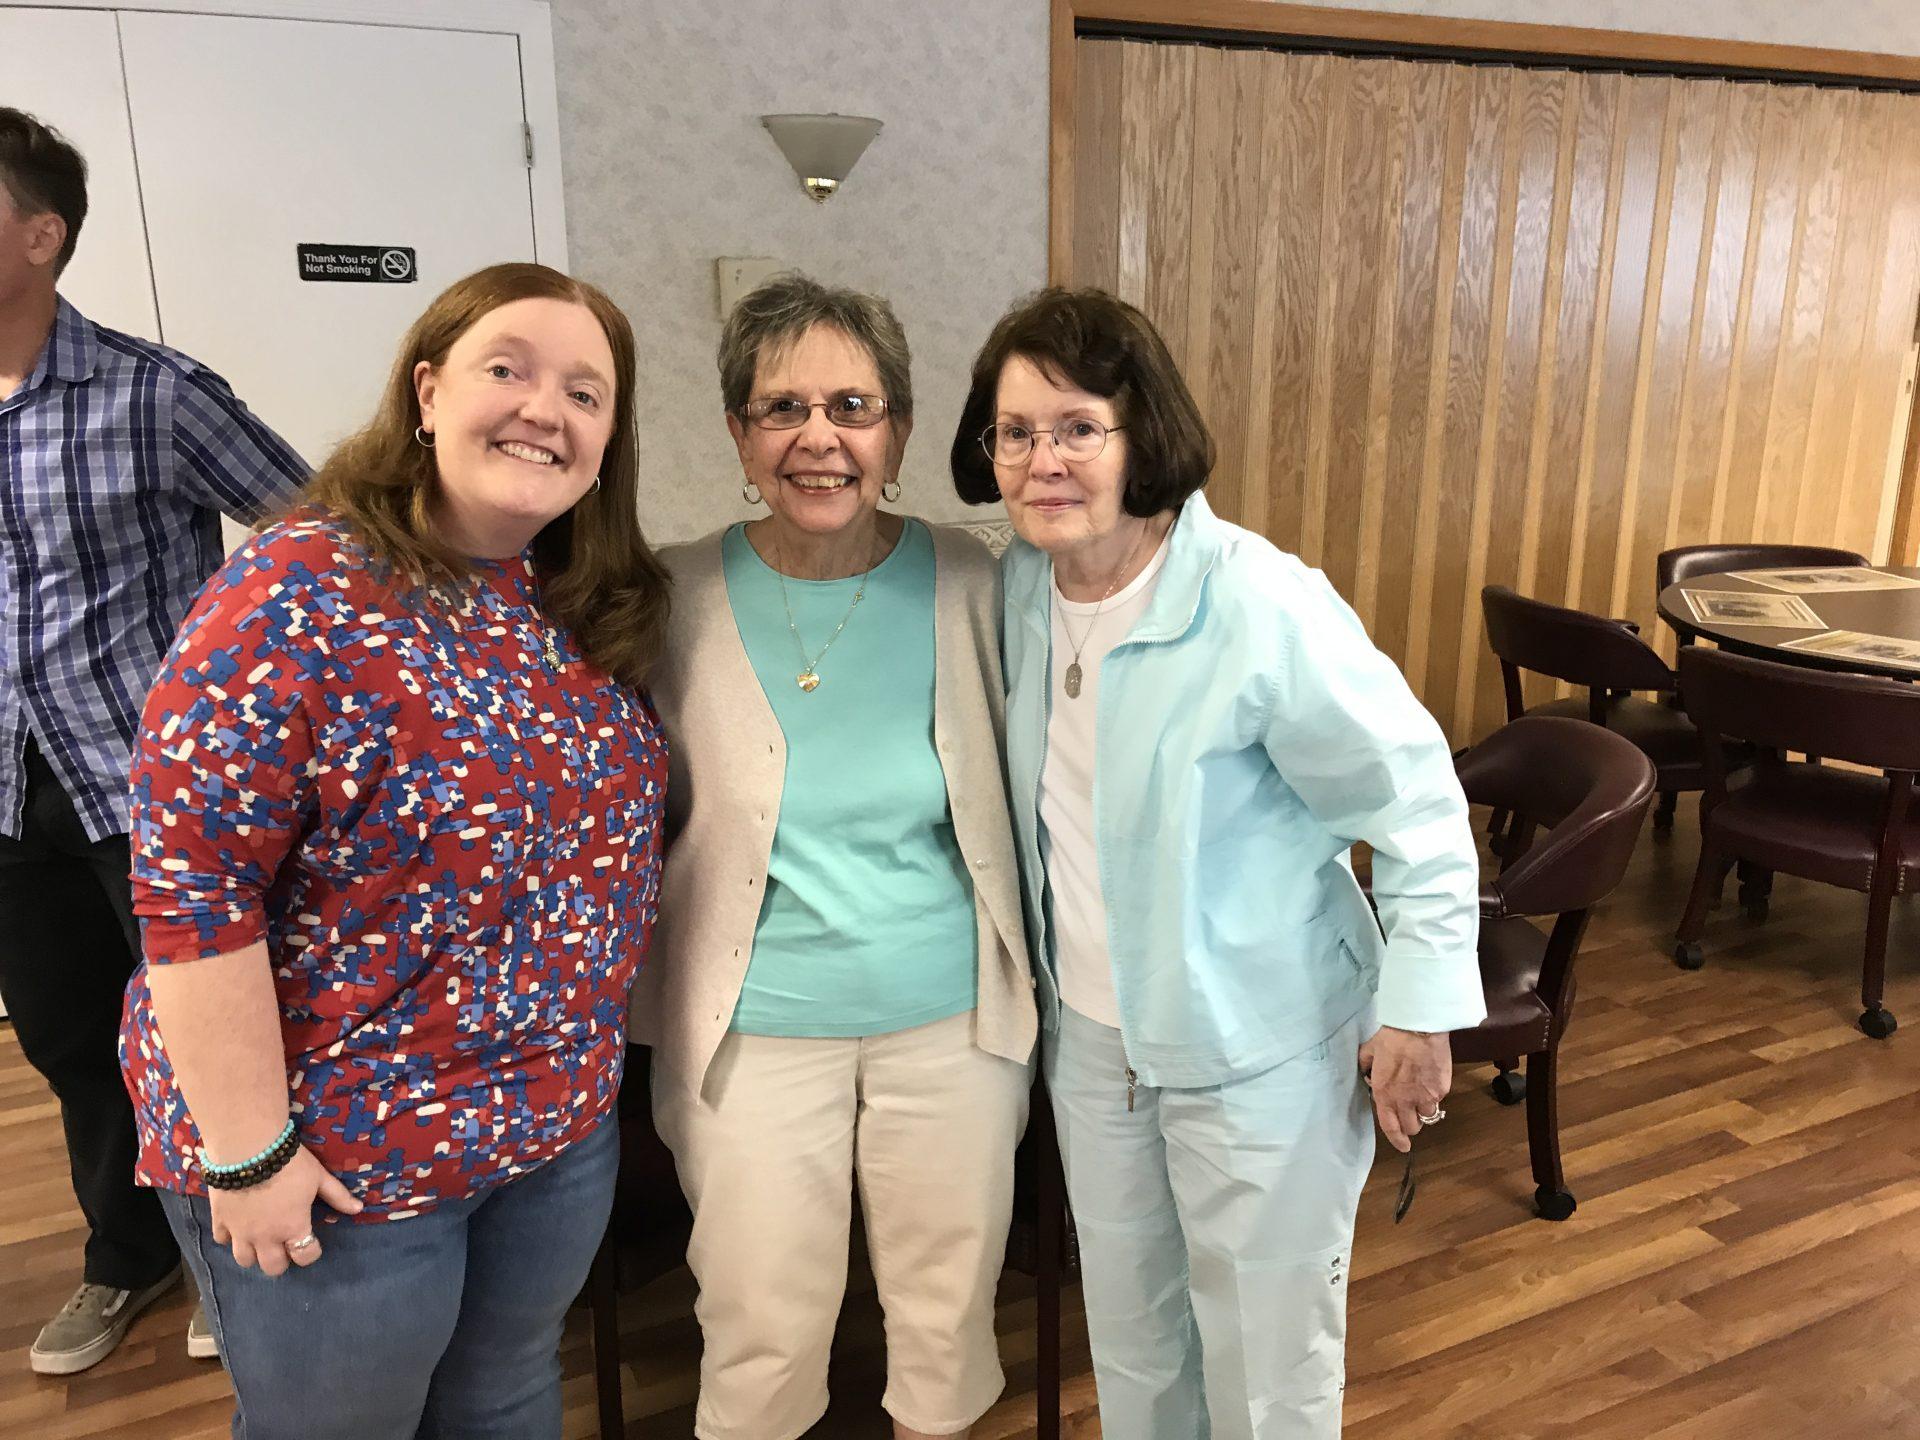 Kostolansky/Townsend  Family Reunion